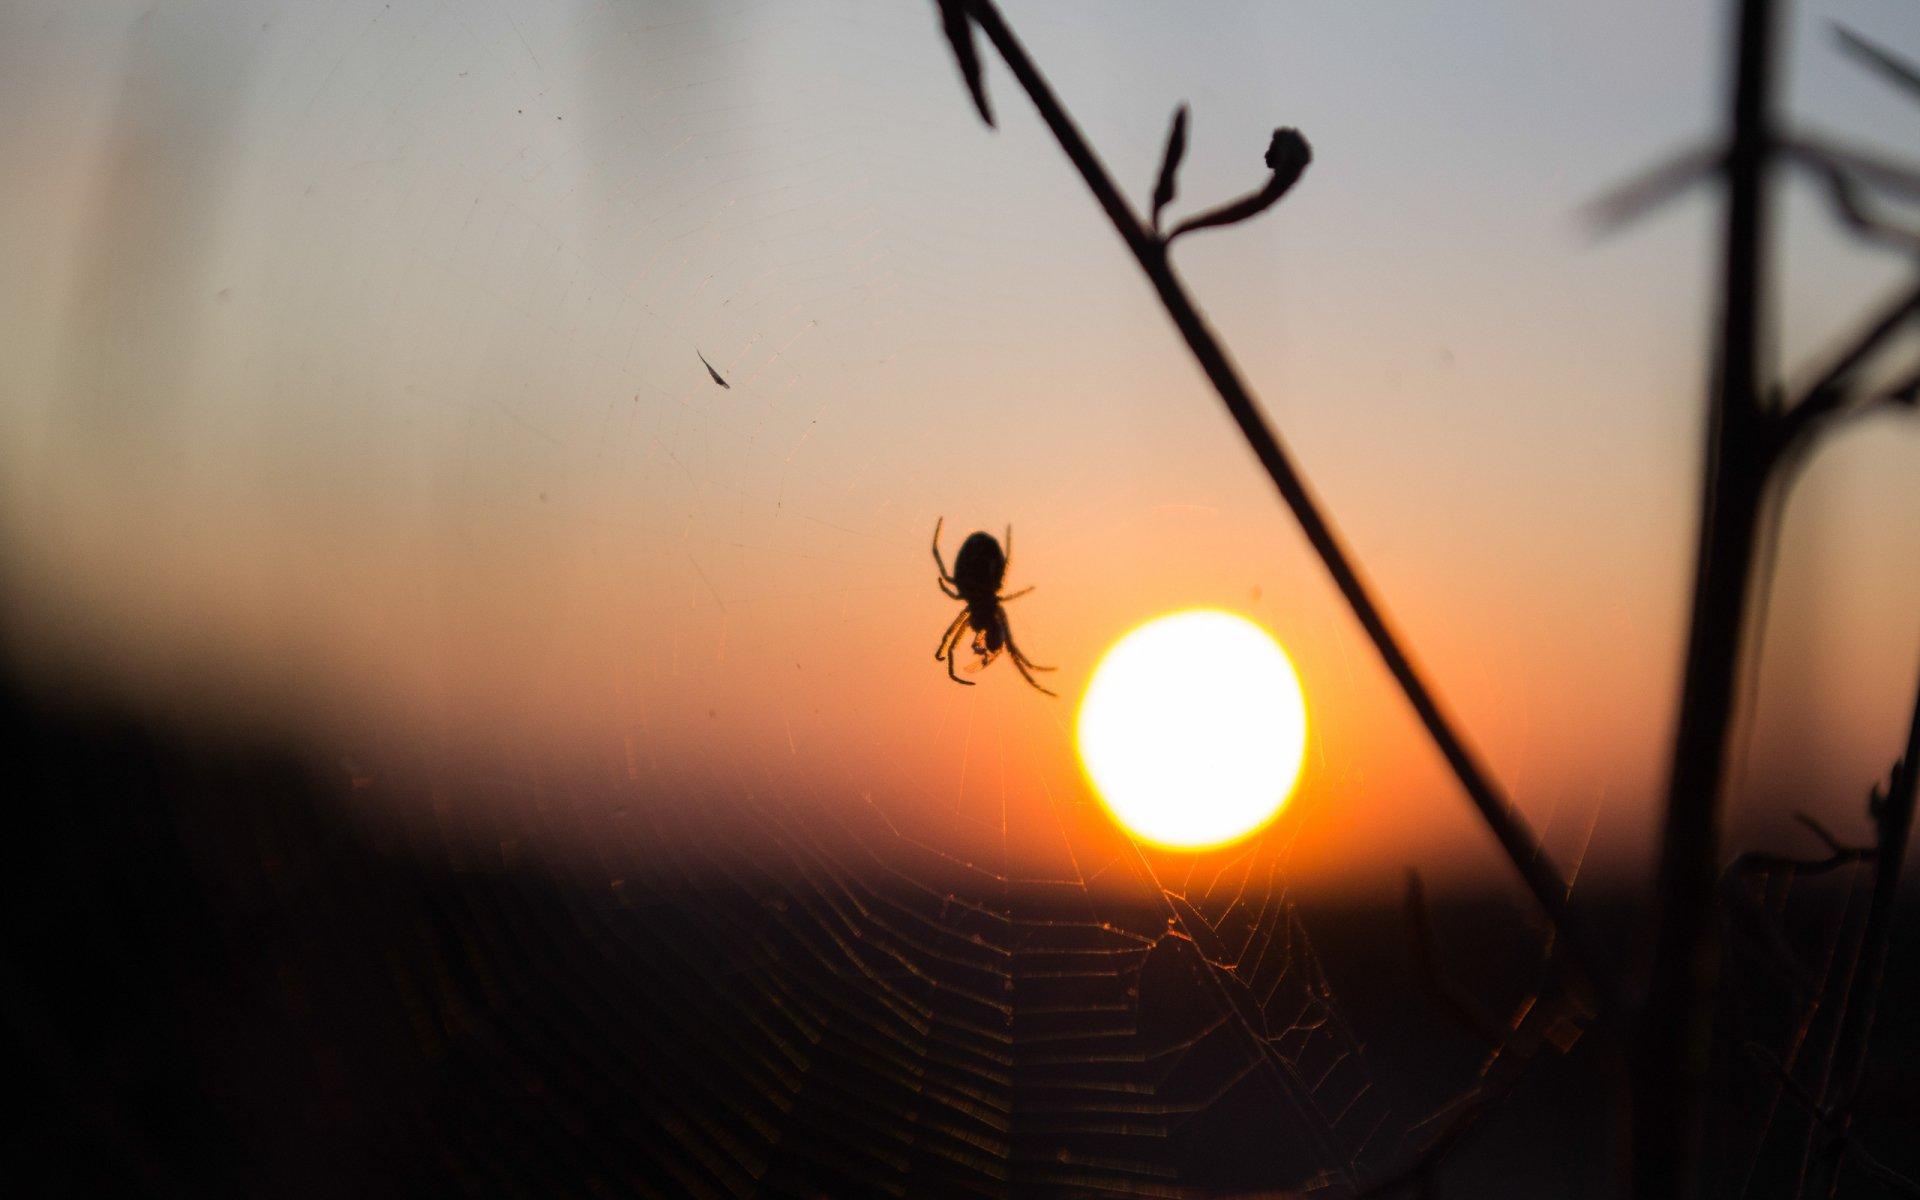 Animal - Spider  Wallpaper